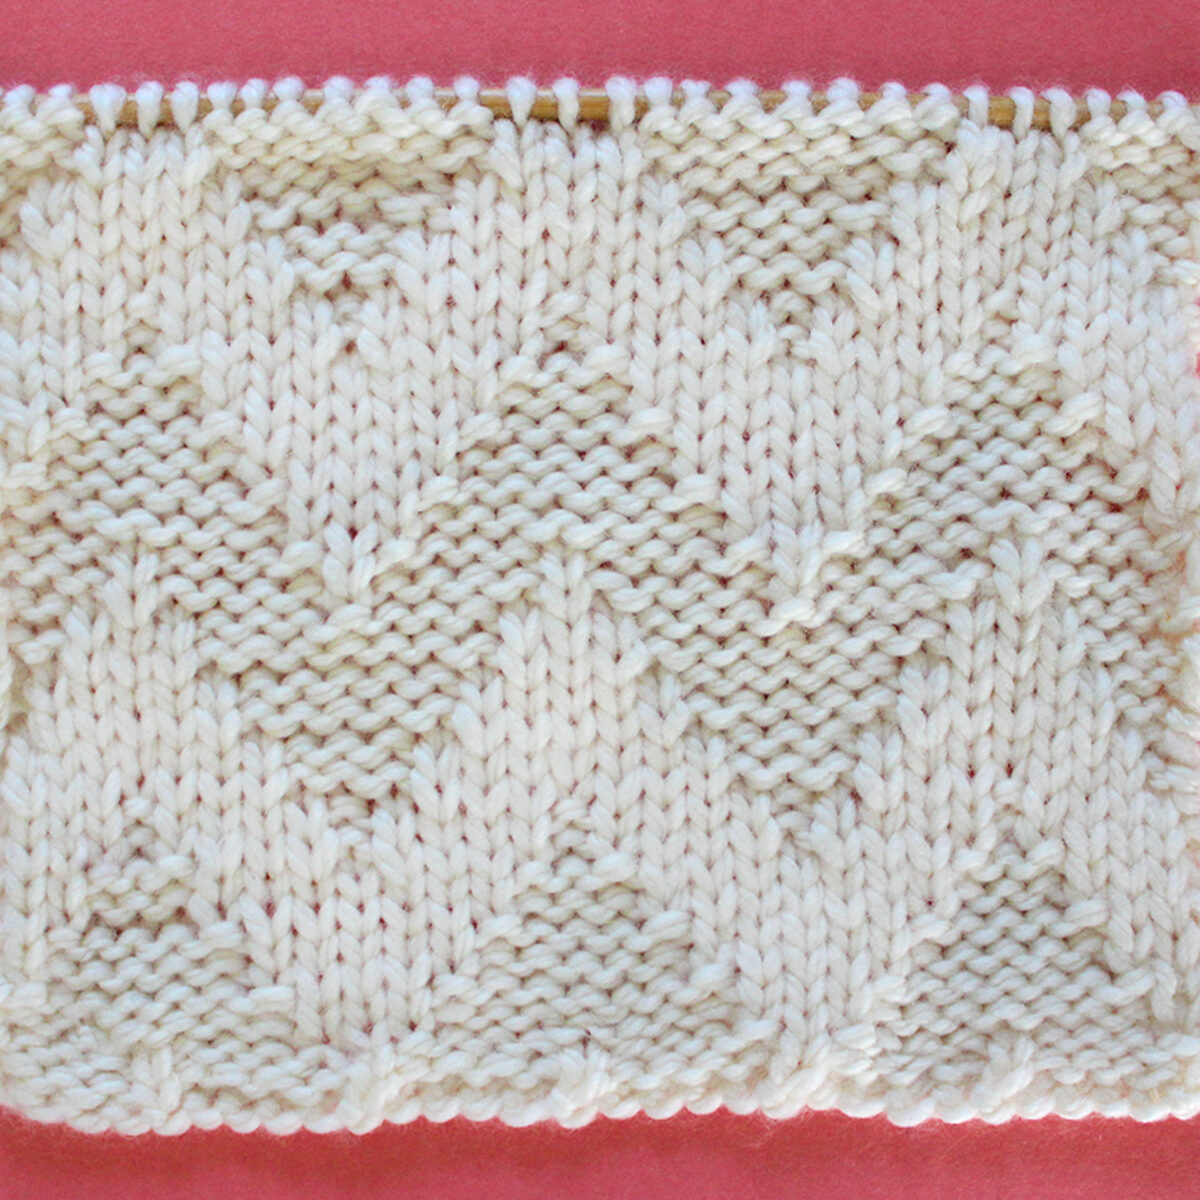 Knitted Wide Chevron Stitch Pattern in white yarn on knitting needle.